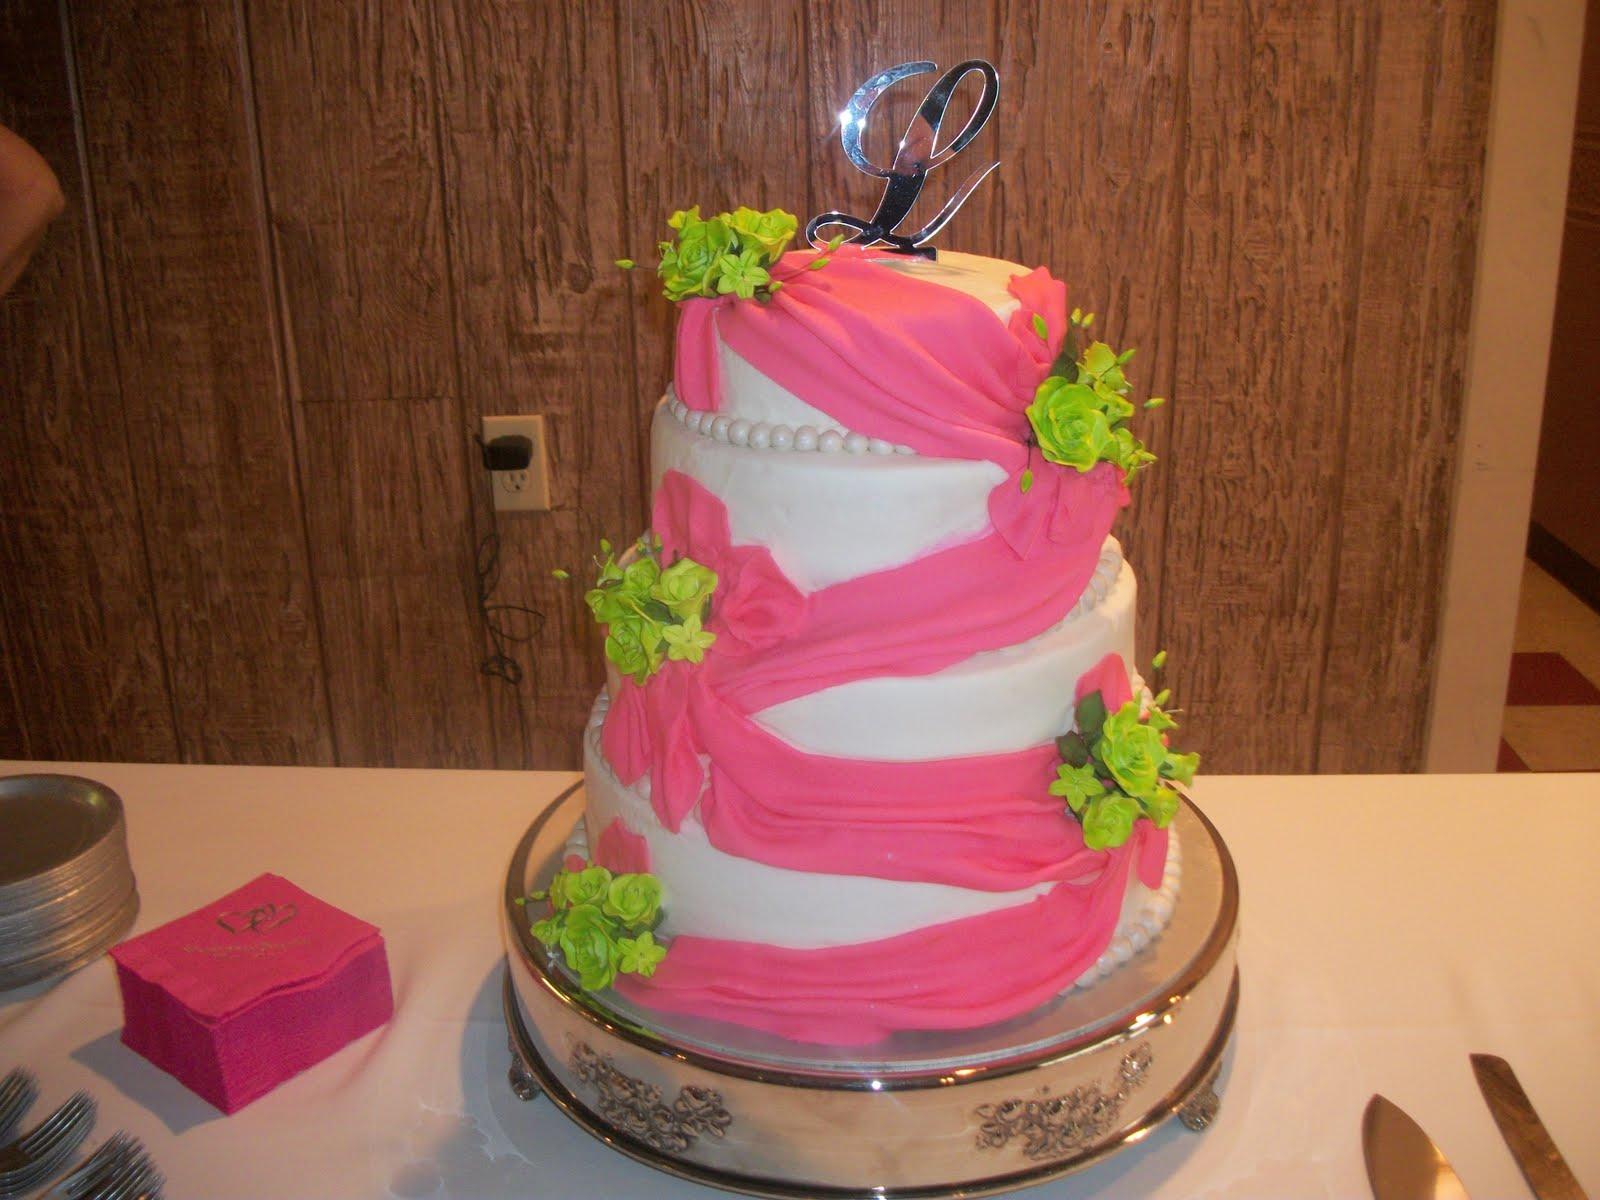 Tasty Cakes: Neon Pink & Green Wedding Cake